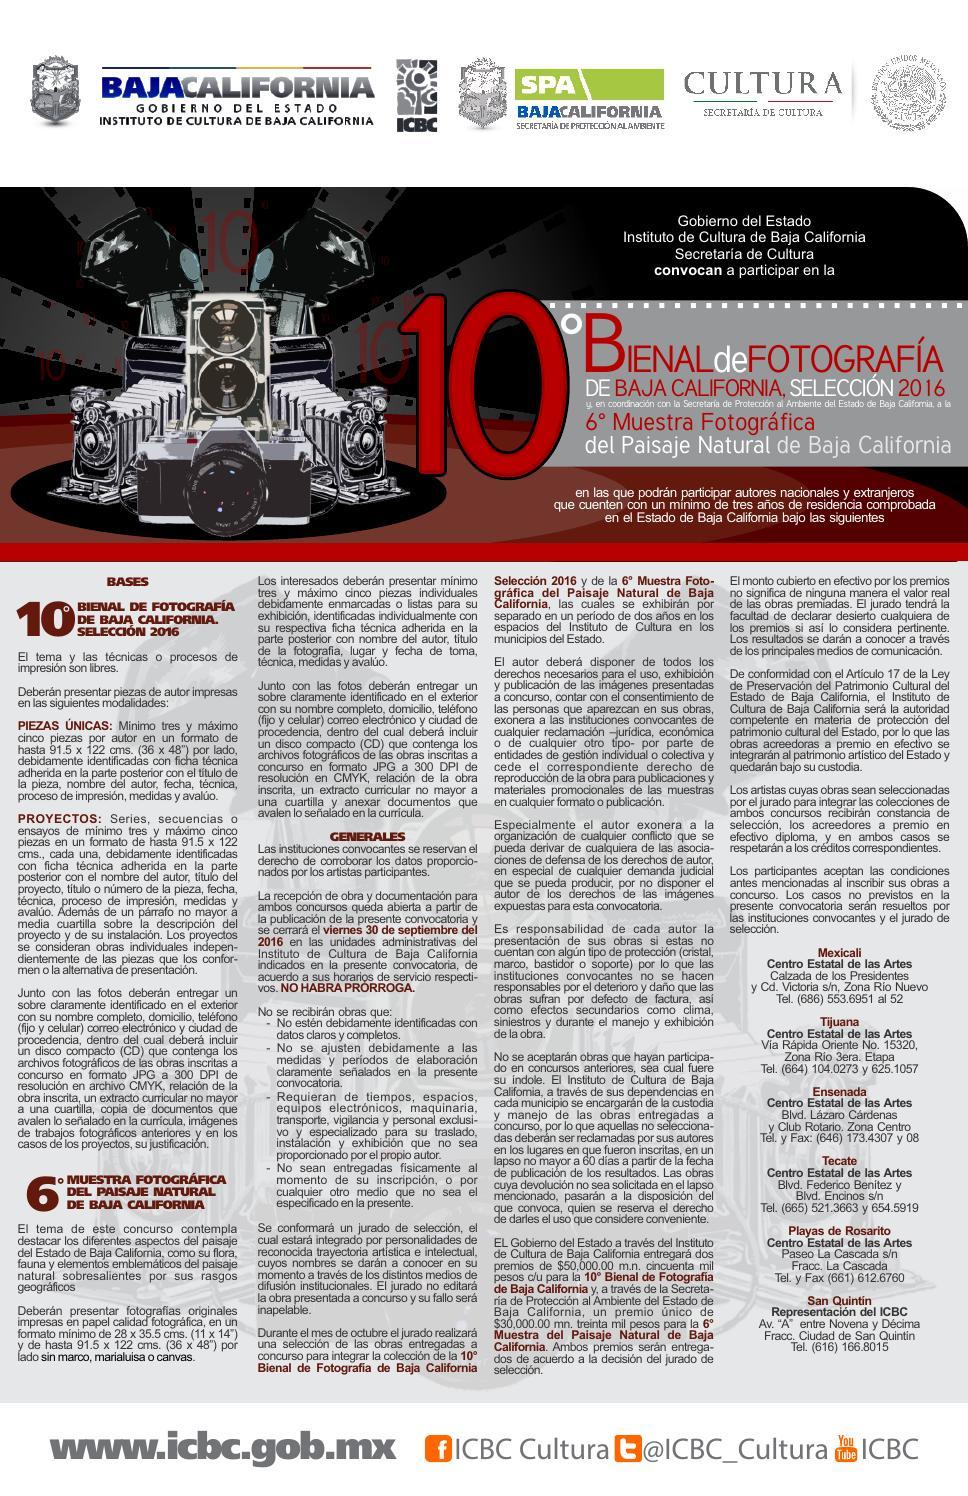 10º Bienal de Fotografía de Baja California by Issa Tuxpan - issuu